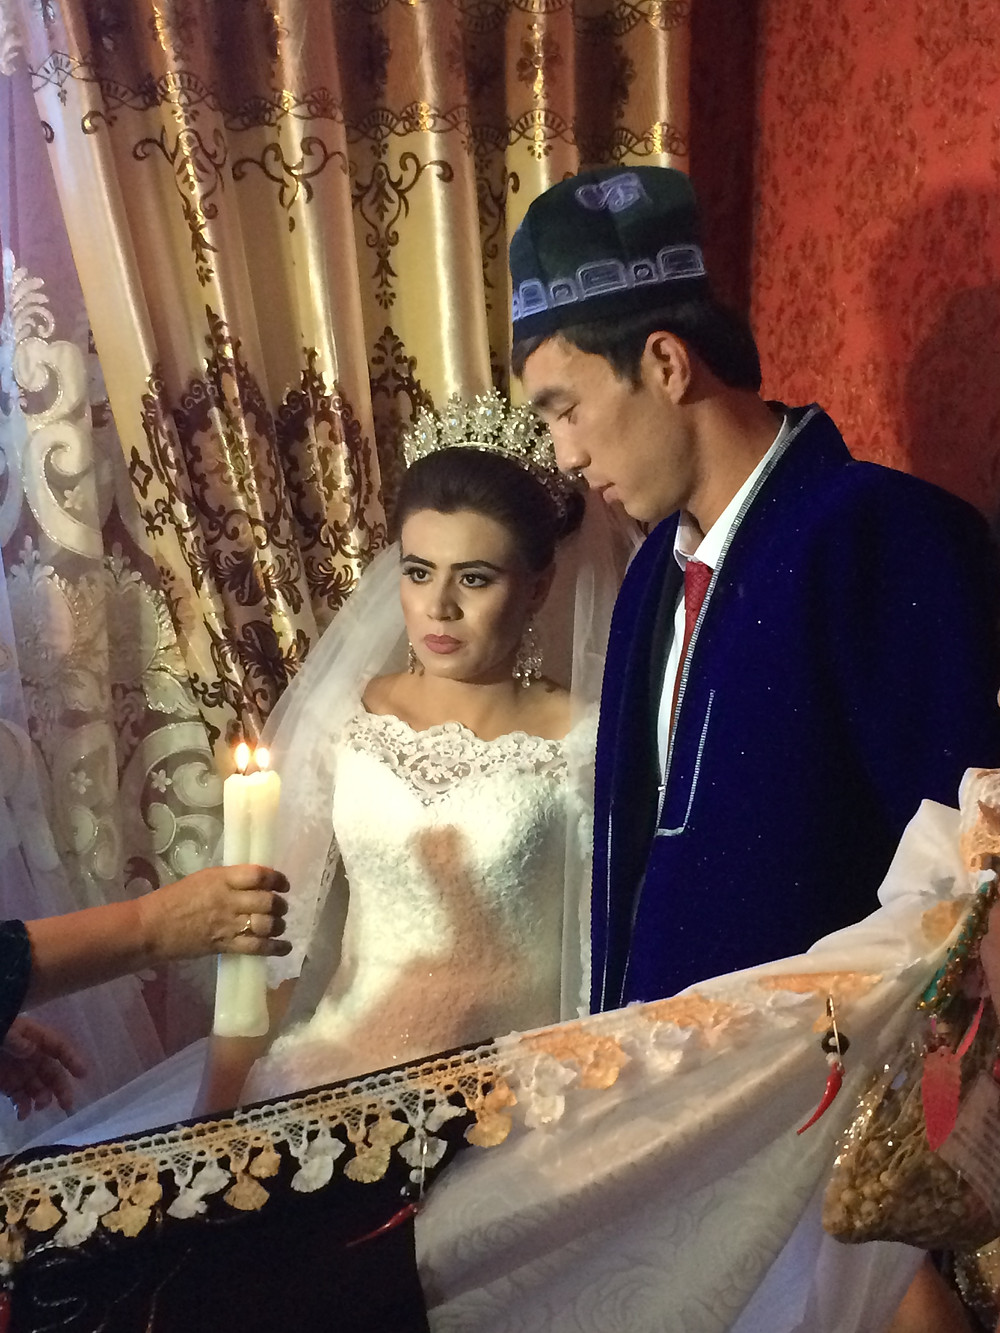 uzbek_wedding_customs